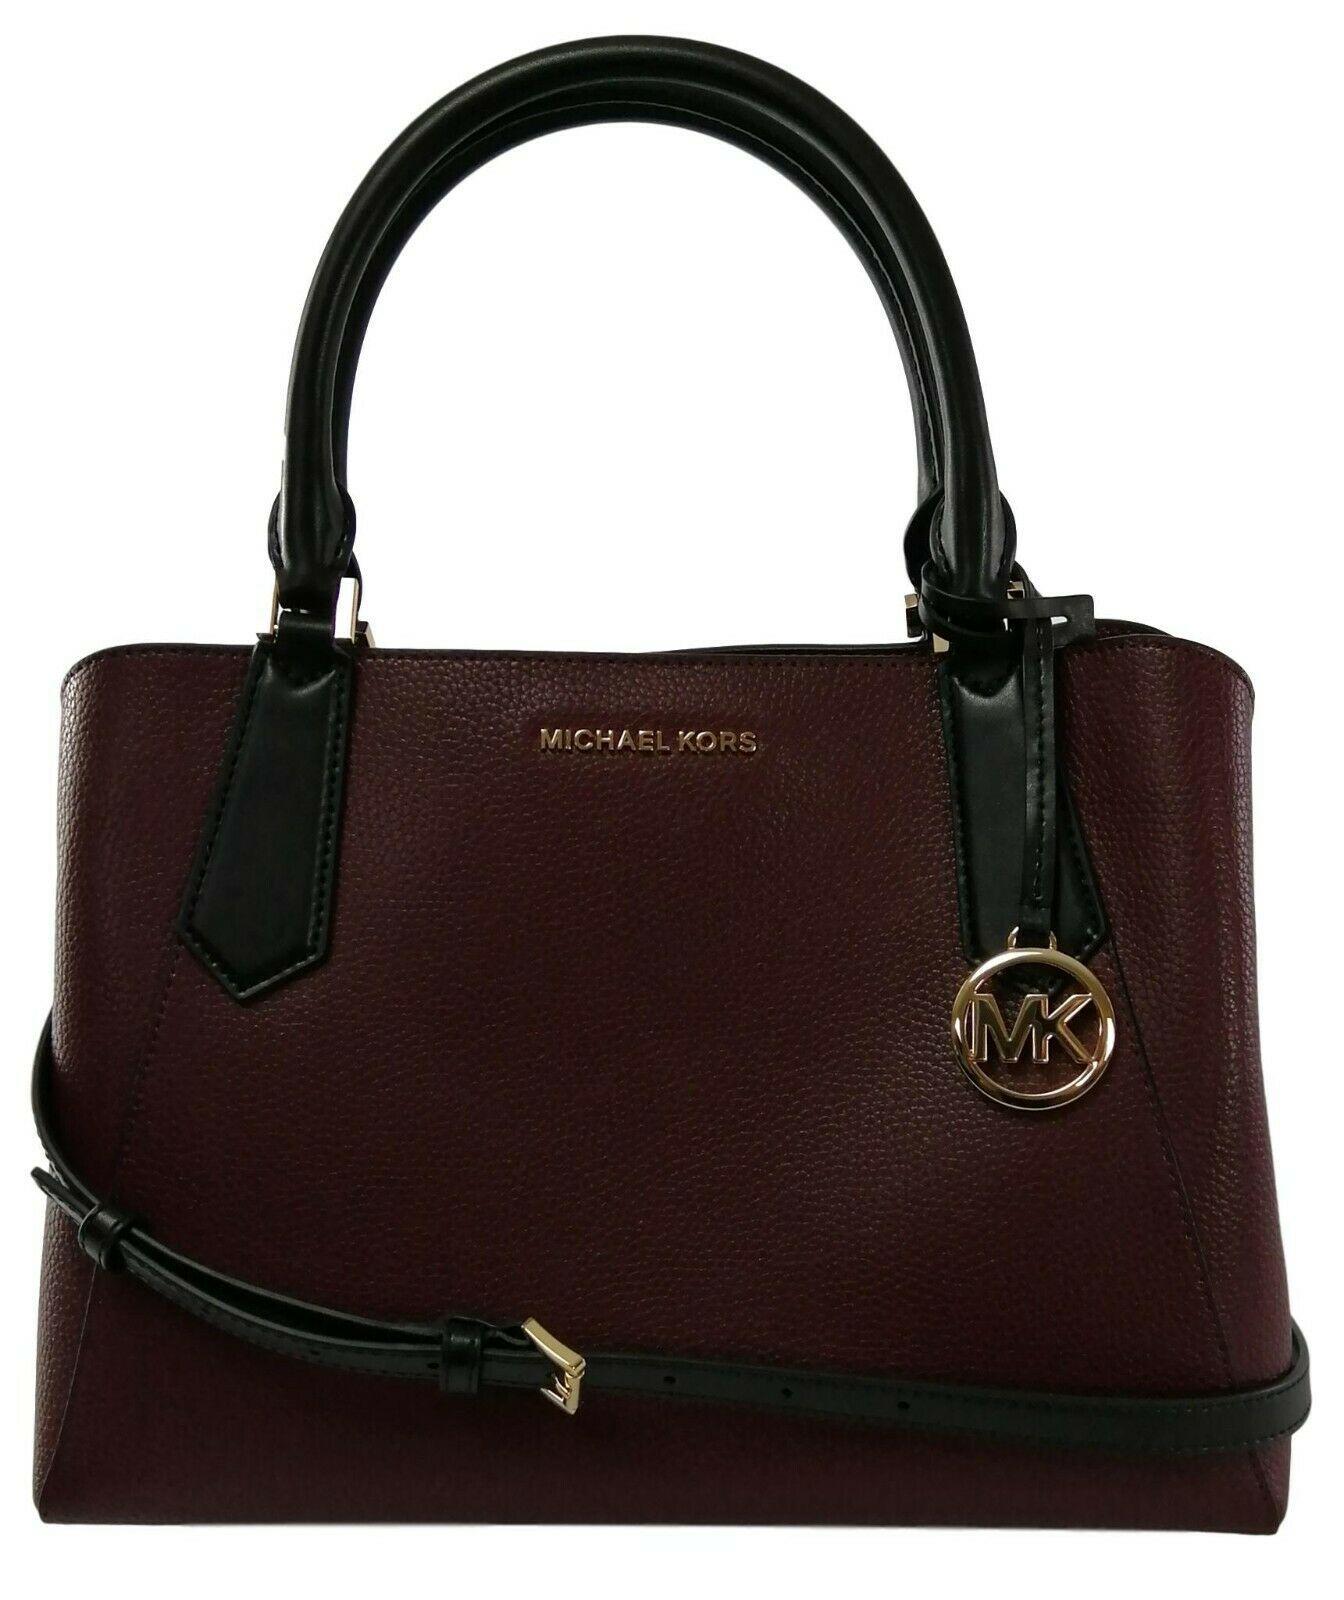 Michael Kors Cartella Top Manico Merlot pelle Rossa Kimberly Bag